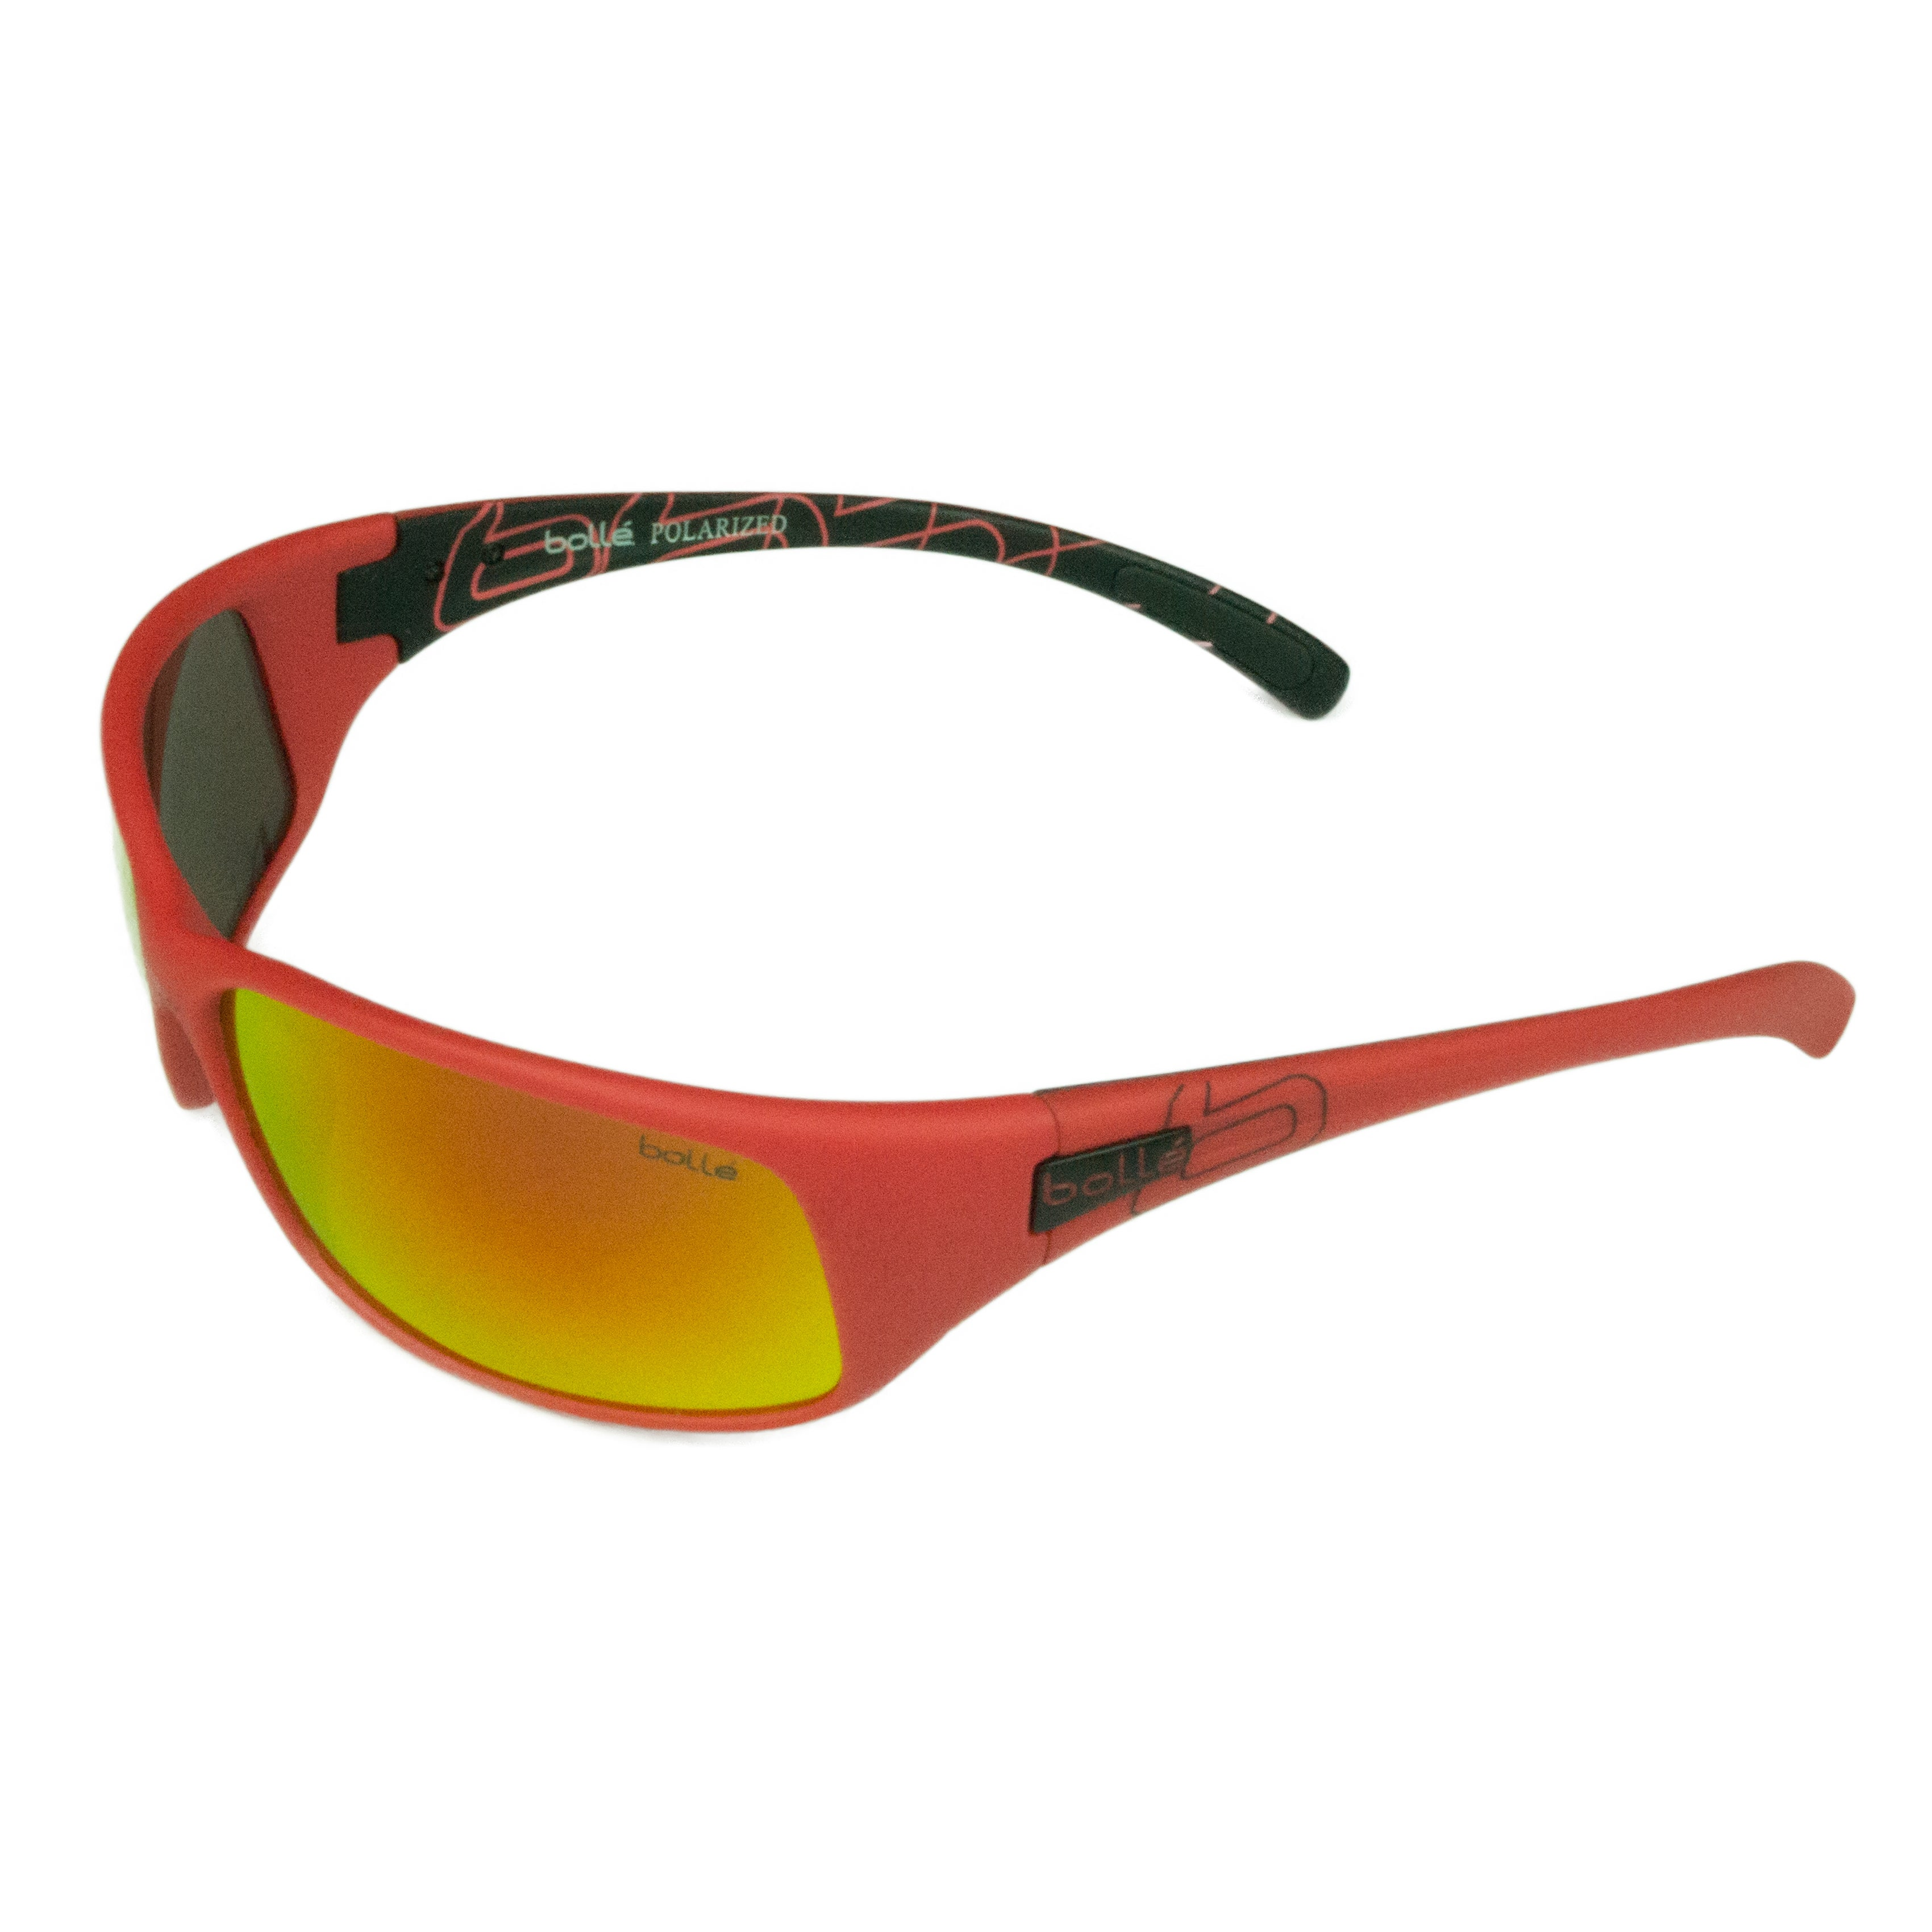 81f20d30e80 Shop Bolle Sport Mens Recoil Sunglasses - 12127 - Free Shipping ...